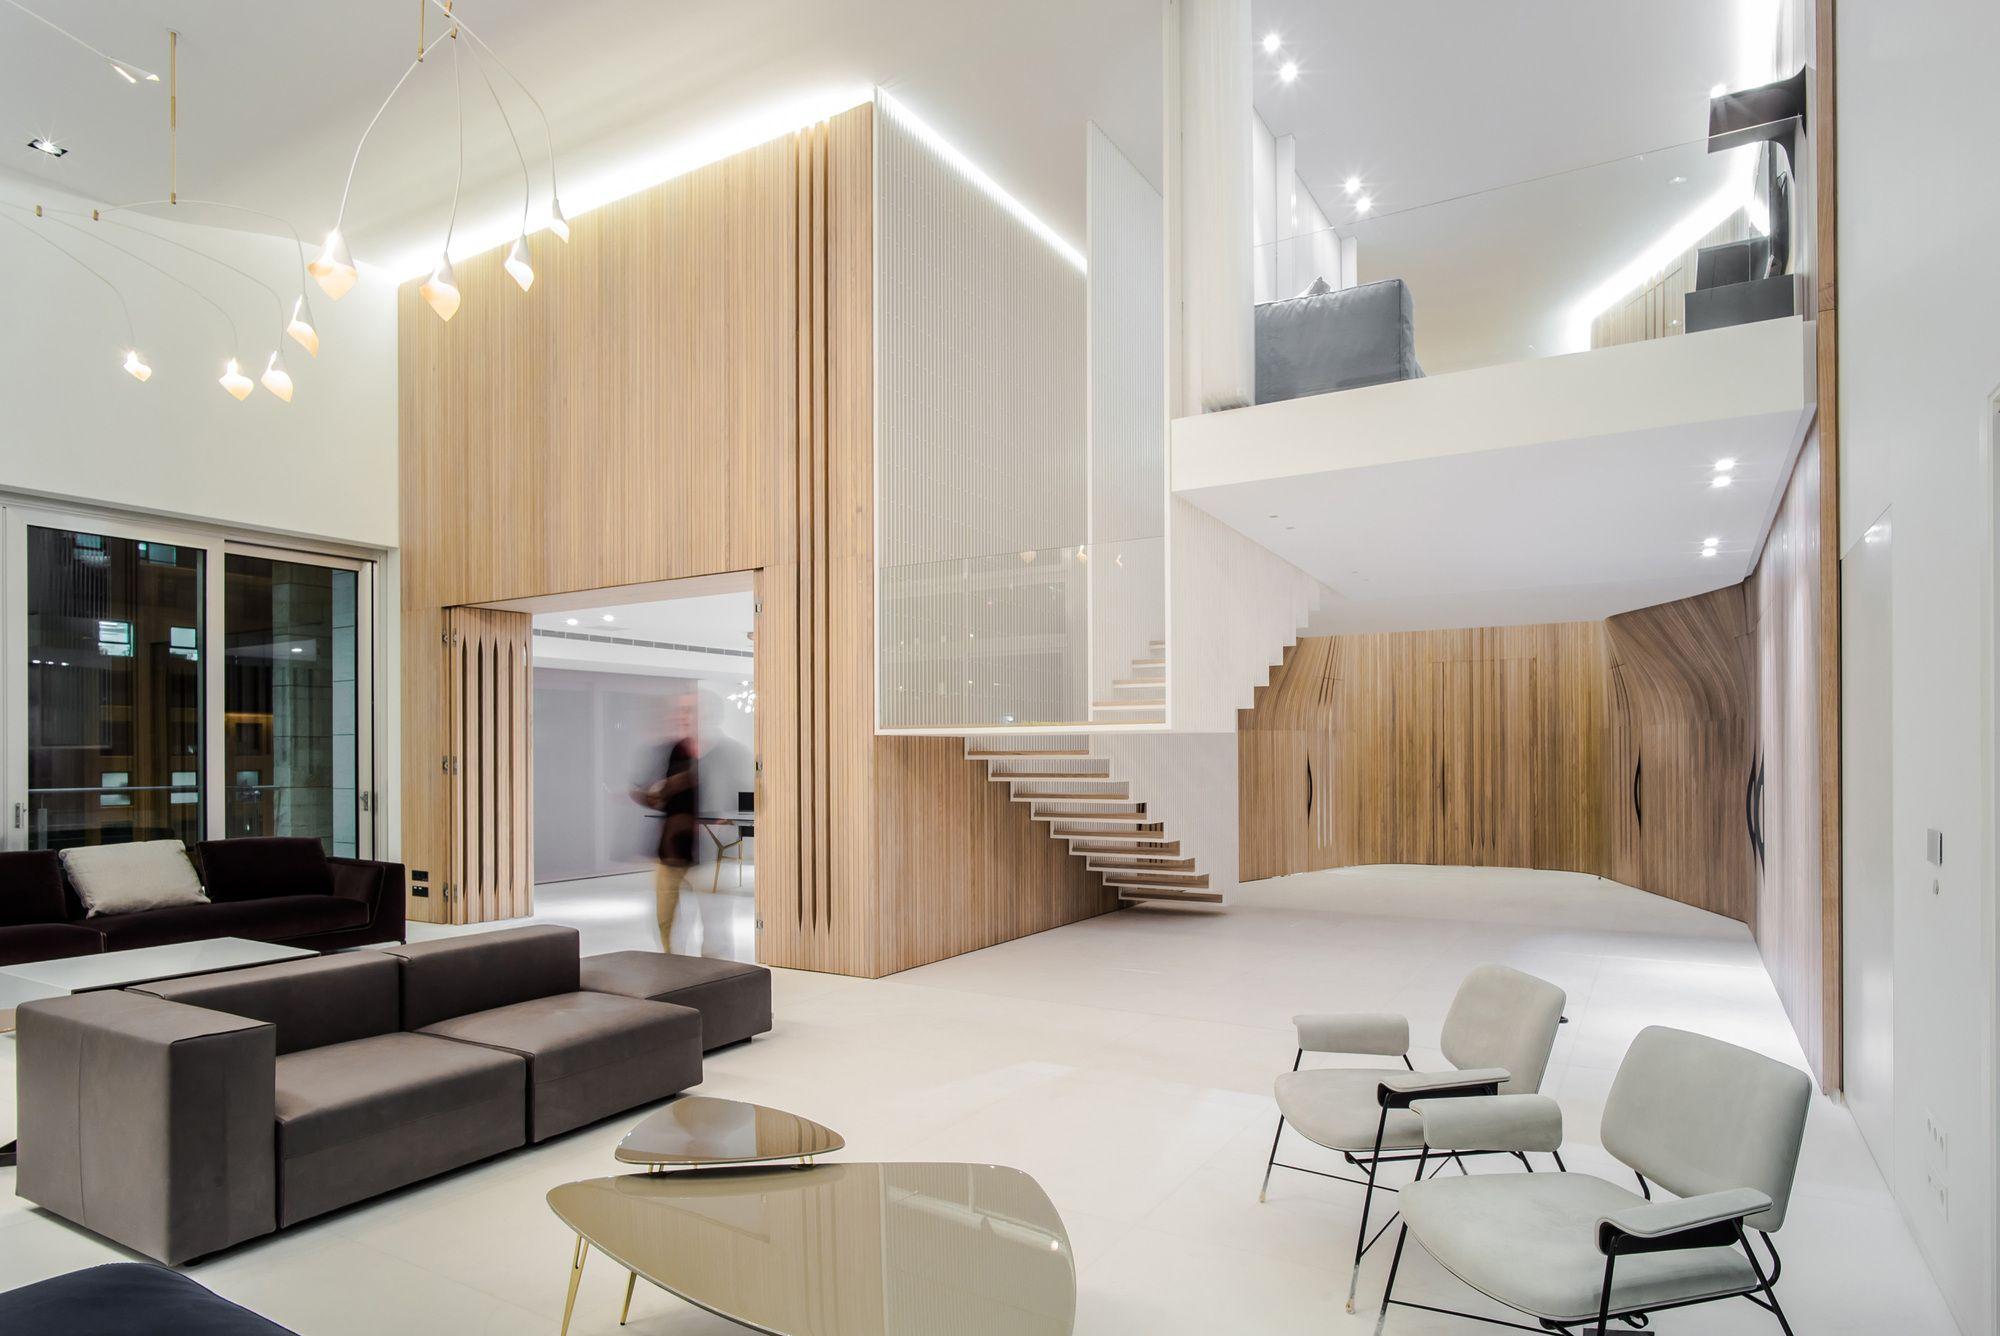 Wadi Penthouse Platau Interior Design Styles